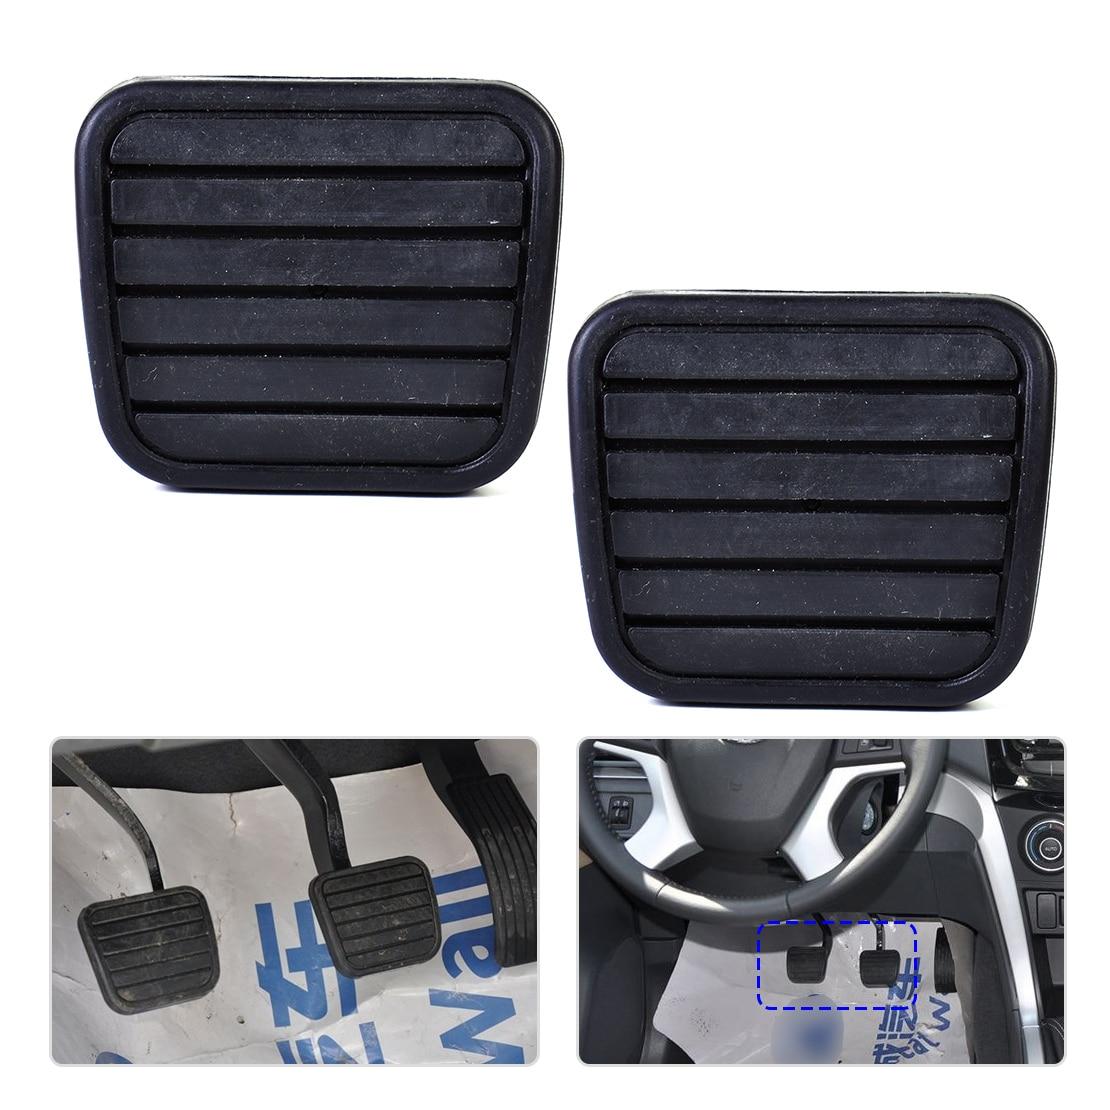 DWCX 2pcs Car Clutch Brake Pedal Pad Rubber Cover Fit For Great Wall V200 K2 2.0L Man Dual Cab Pick-Up 2012 2013 2014 2015 2016